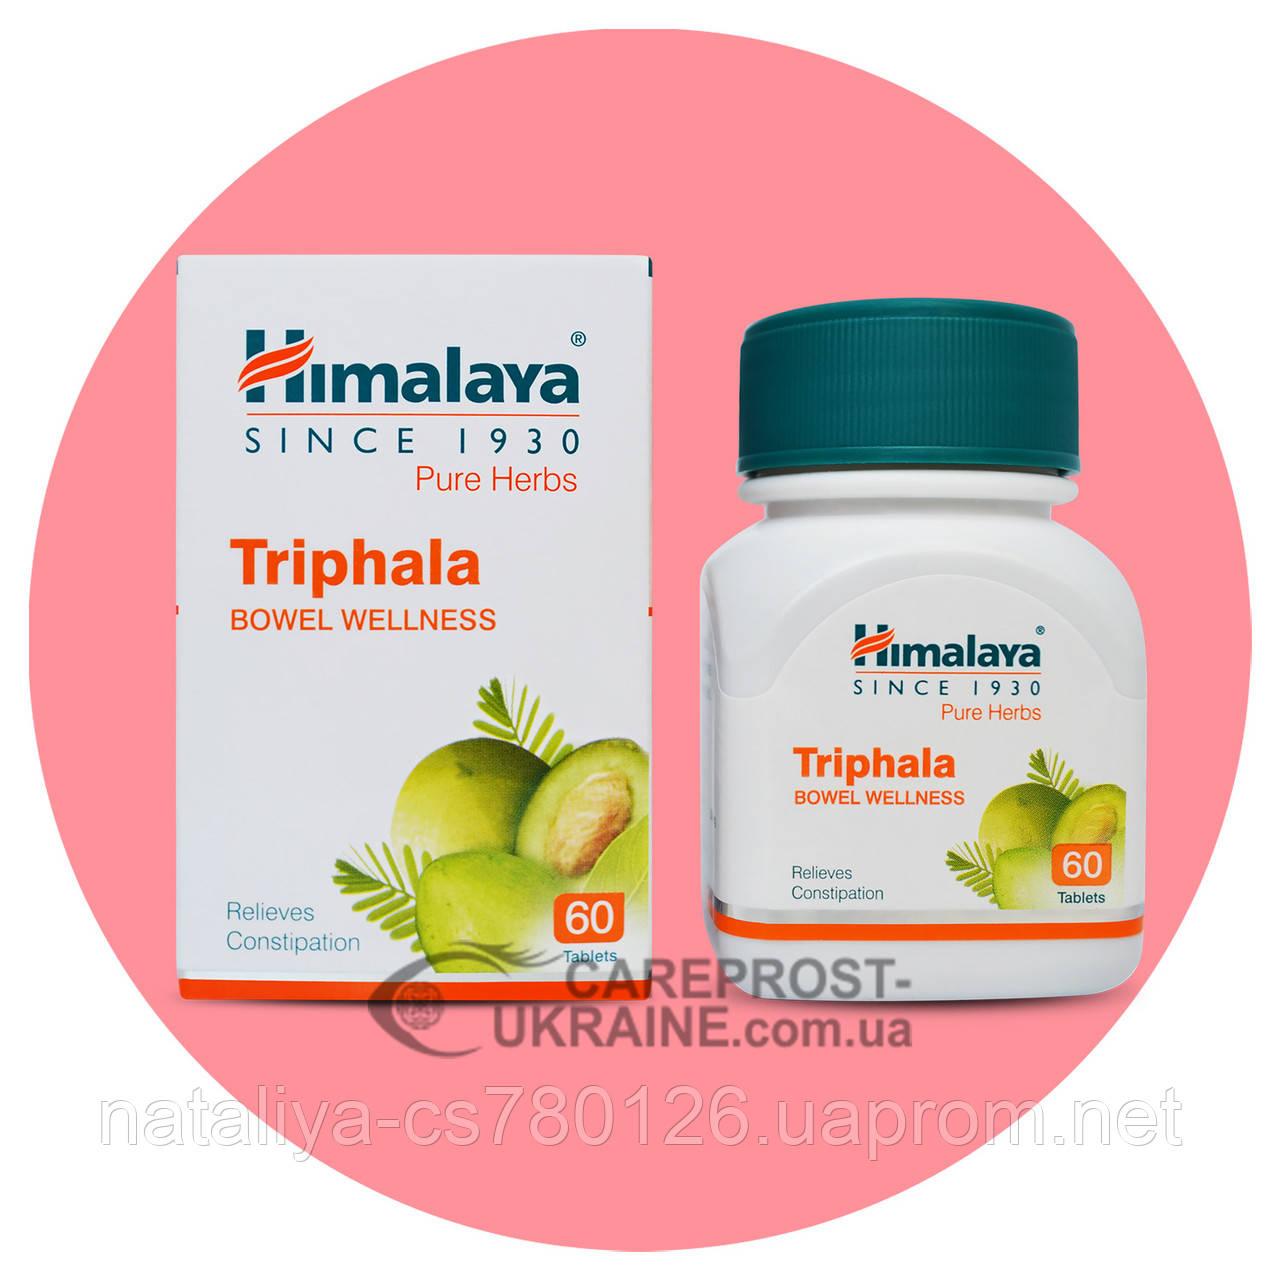 Трифала экстракт Хималая (Triphala Tablets Himalaya), 60 таблеток